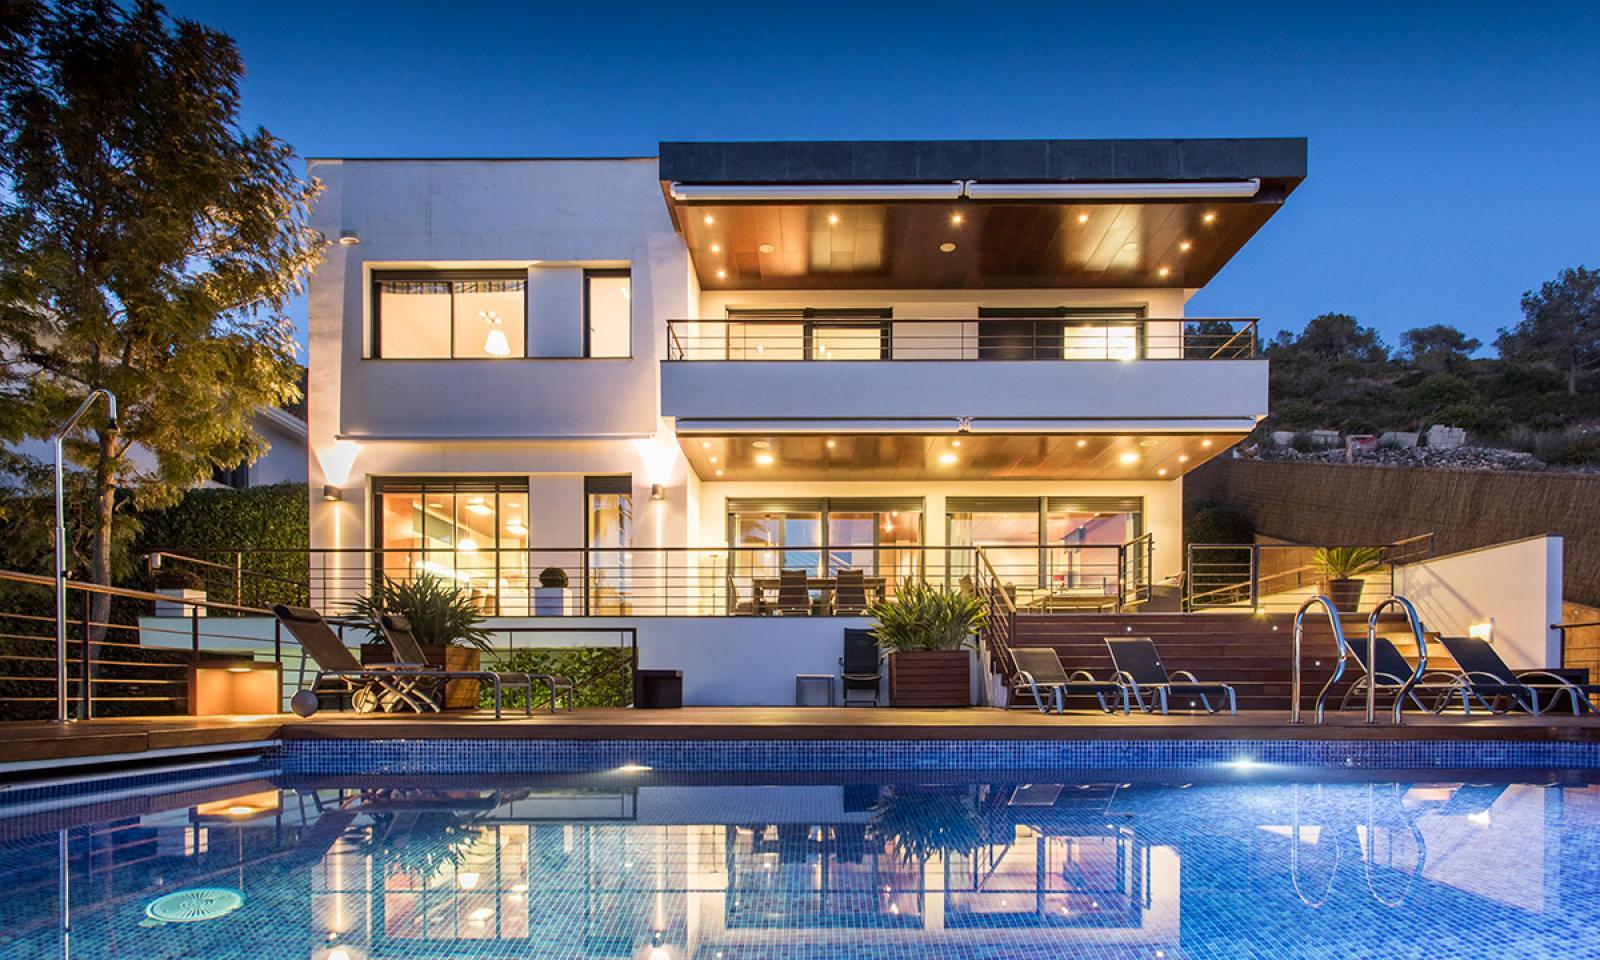 Снять виллу в барселоне цены на недвижимость в дубае 2020